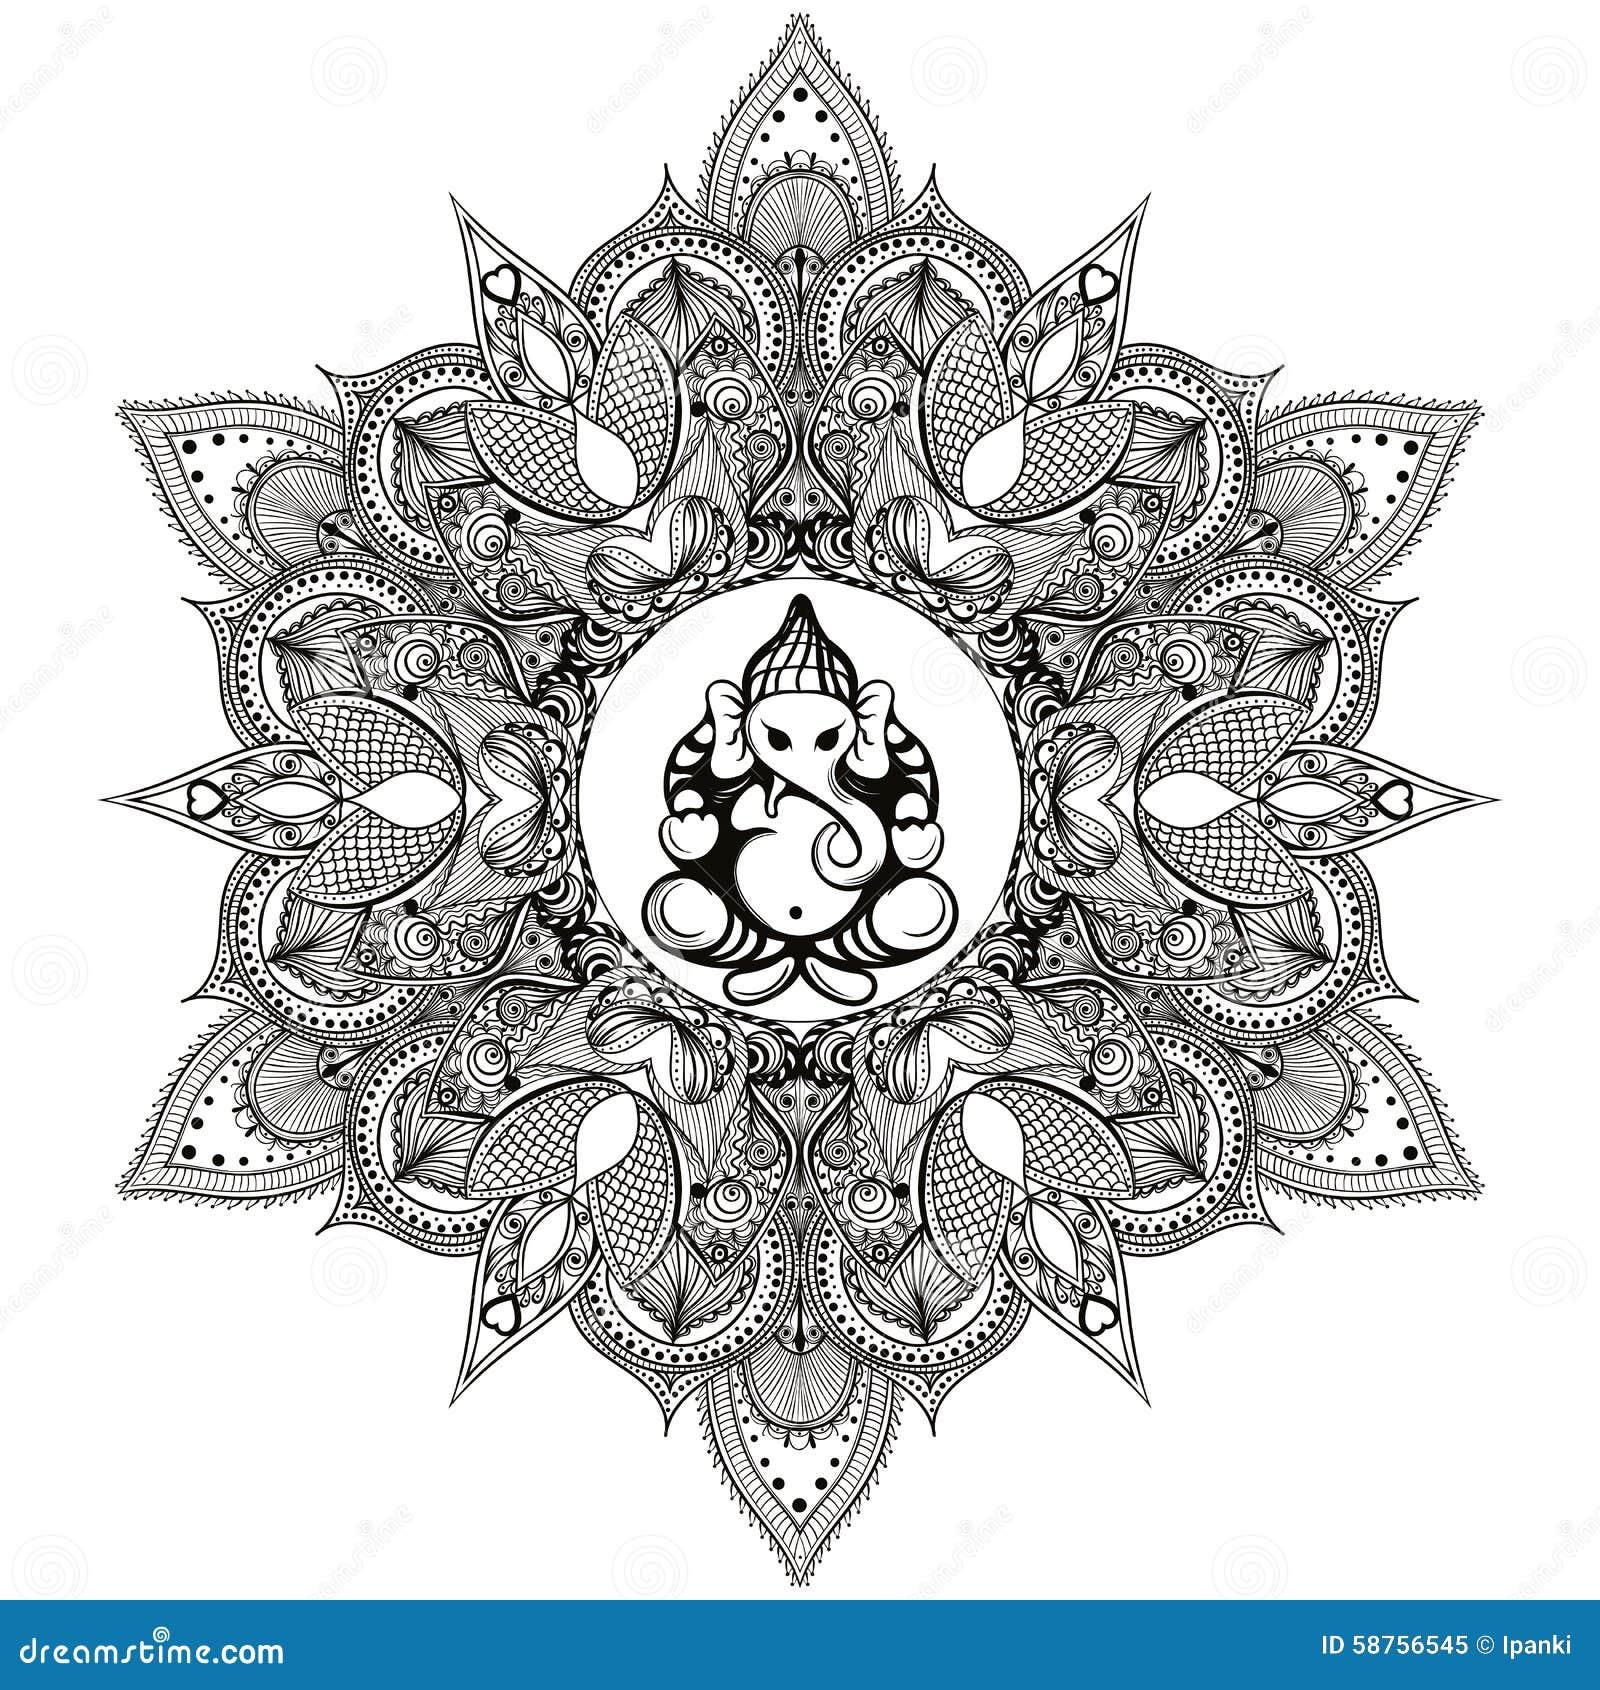 Buddhist Elephant Tattoo Designs